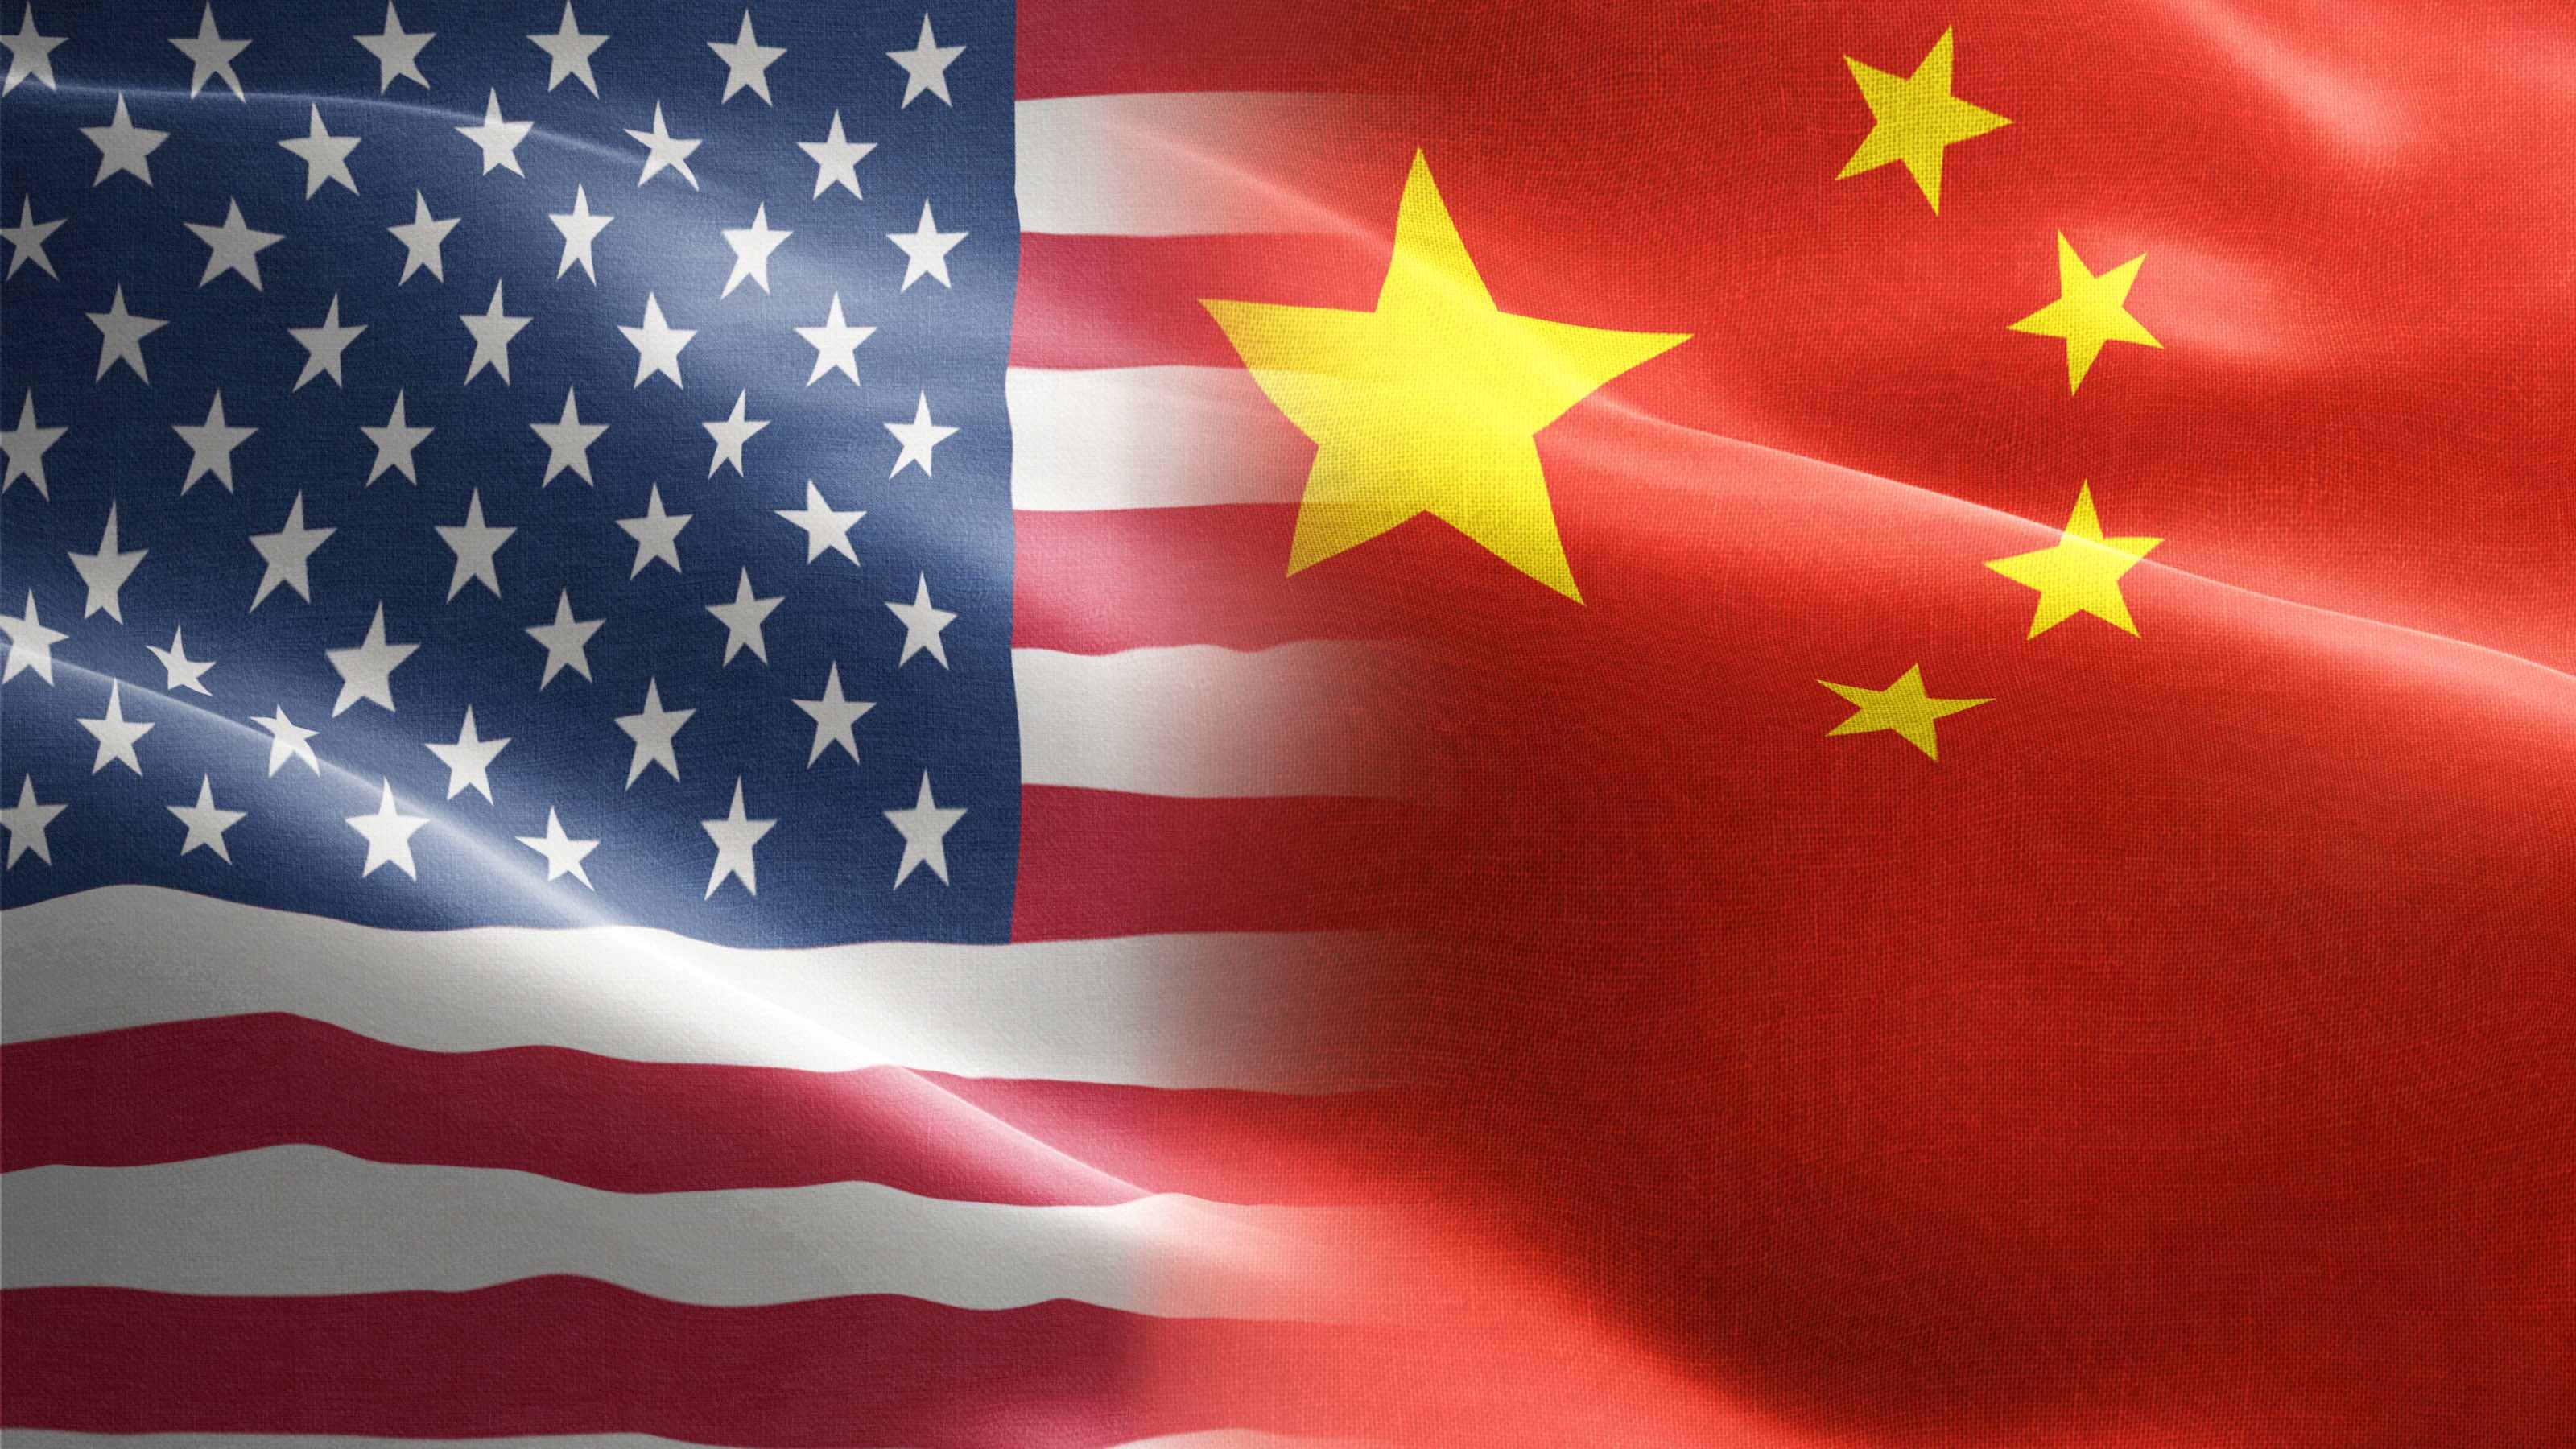 Stock Market Today: U.S. Stocks Grab the Baton From China | Kiplinger